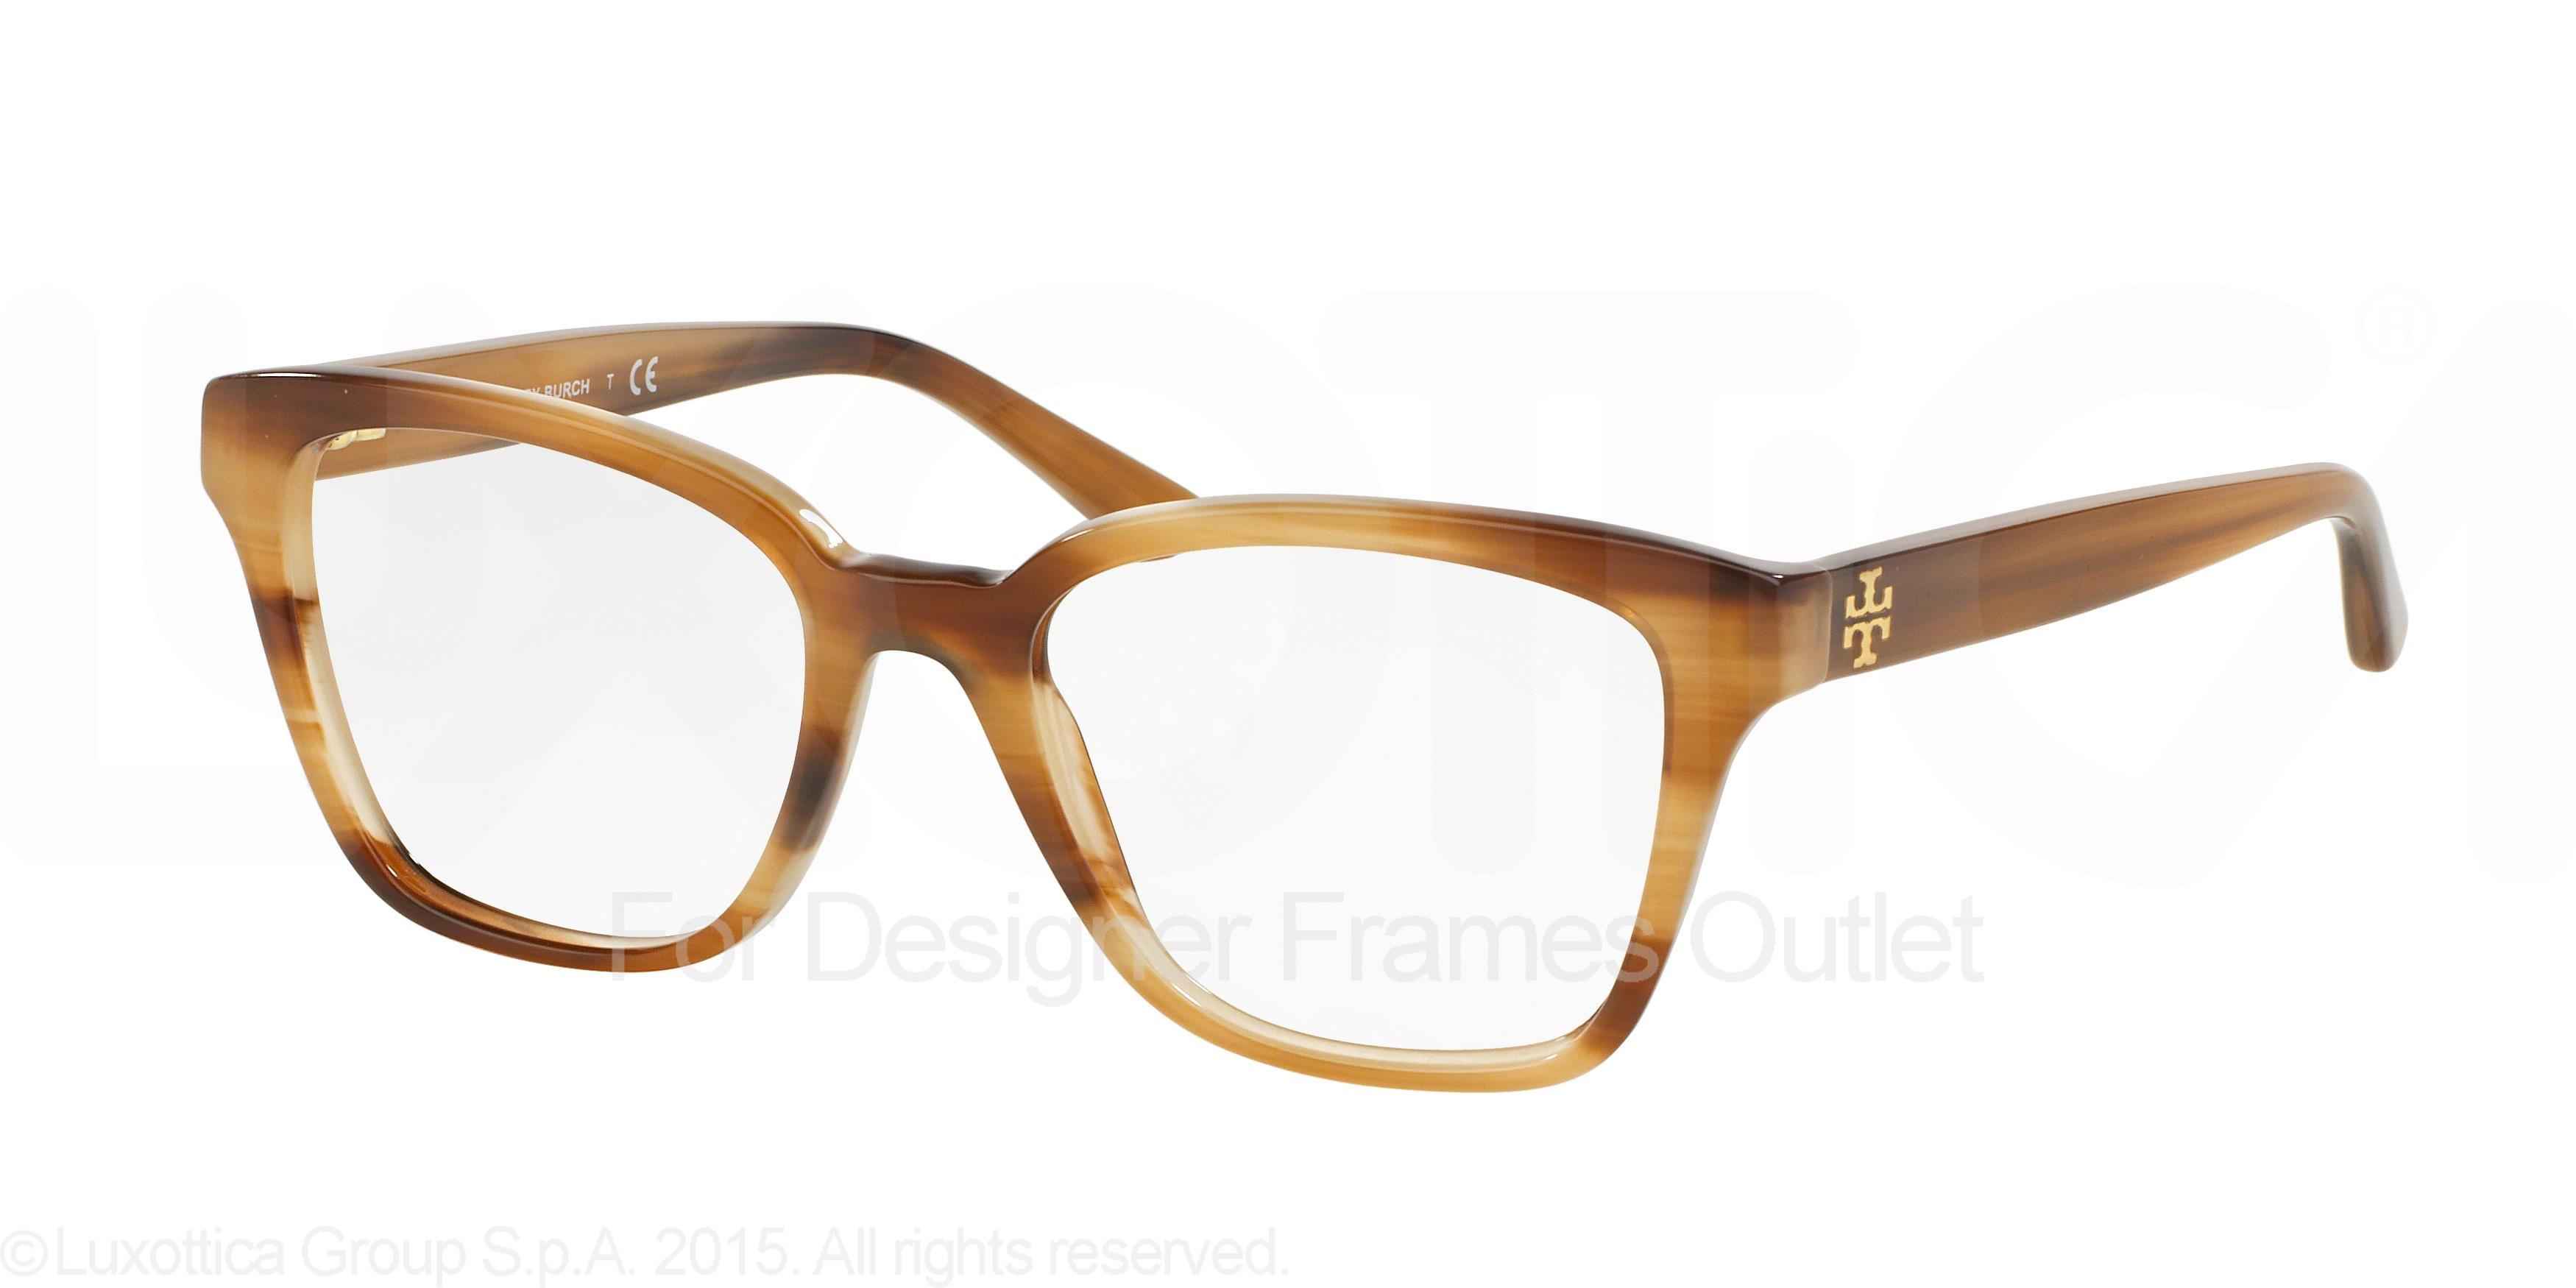 1c2debcc0ed3 TORY BURCH Eyeglasses TY 2052 1416 Medium Horn 49MM - Walmart.com